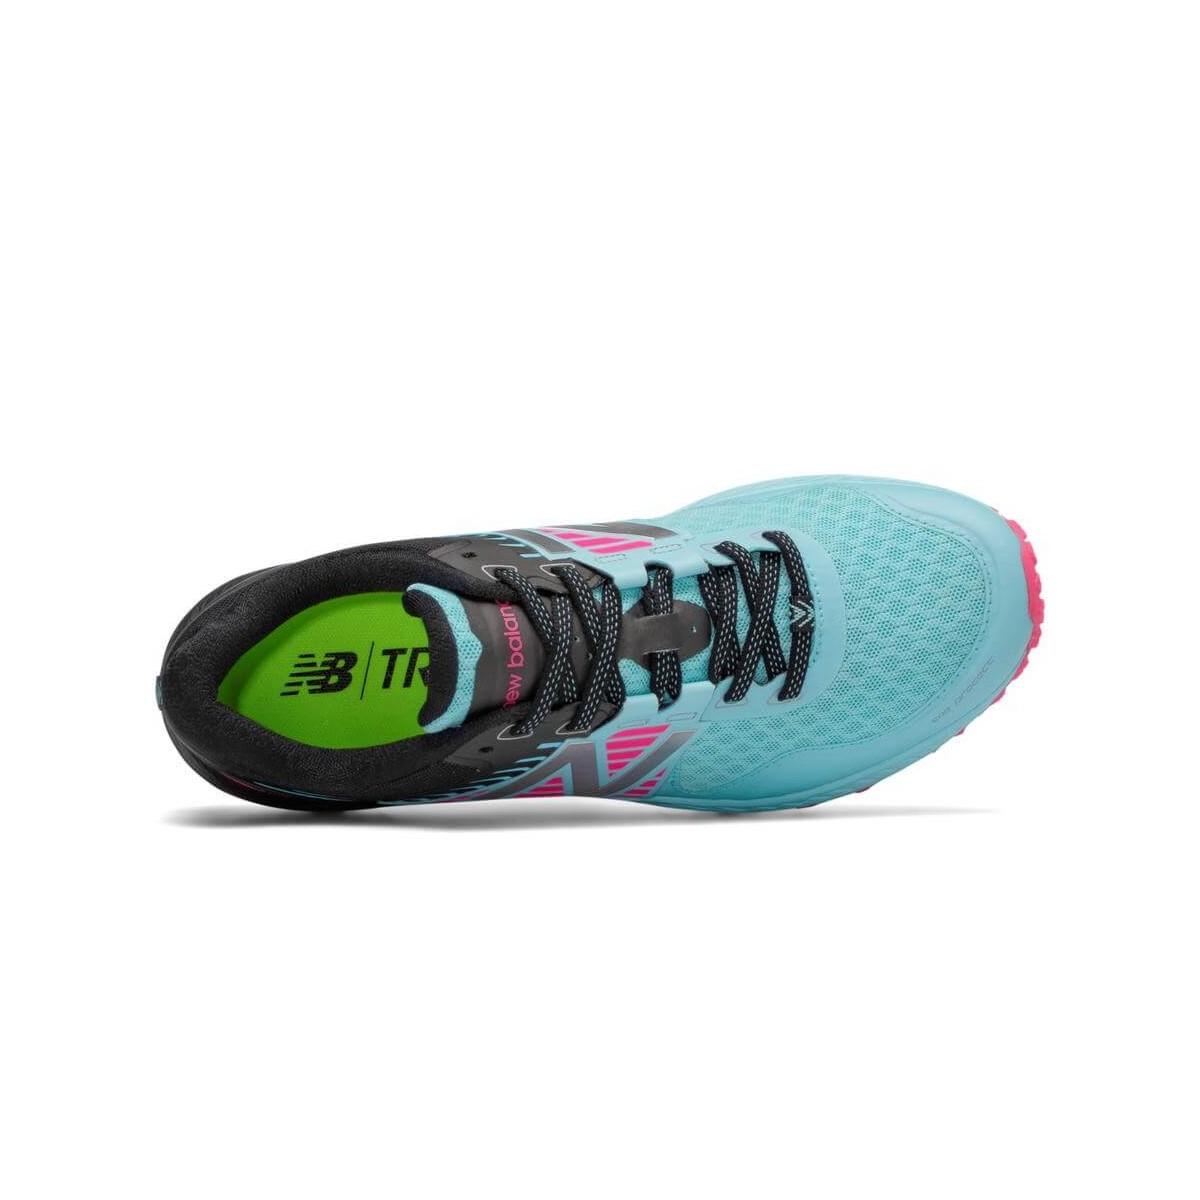 Zapatillas New Balance 910 V4 Trail color azul y rosa Mujer